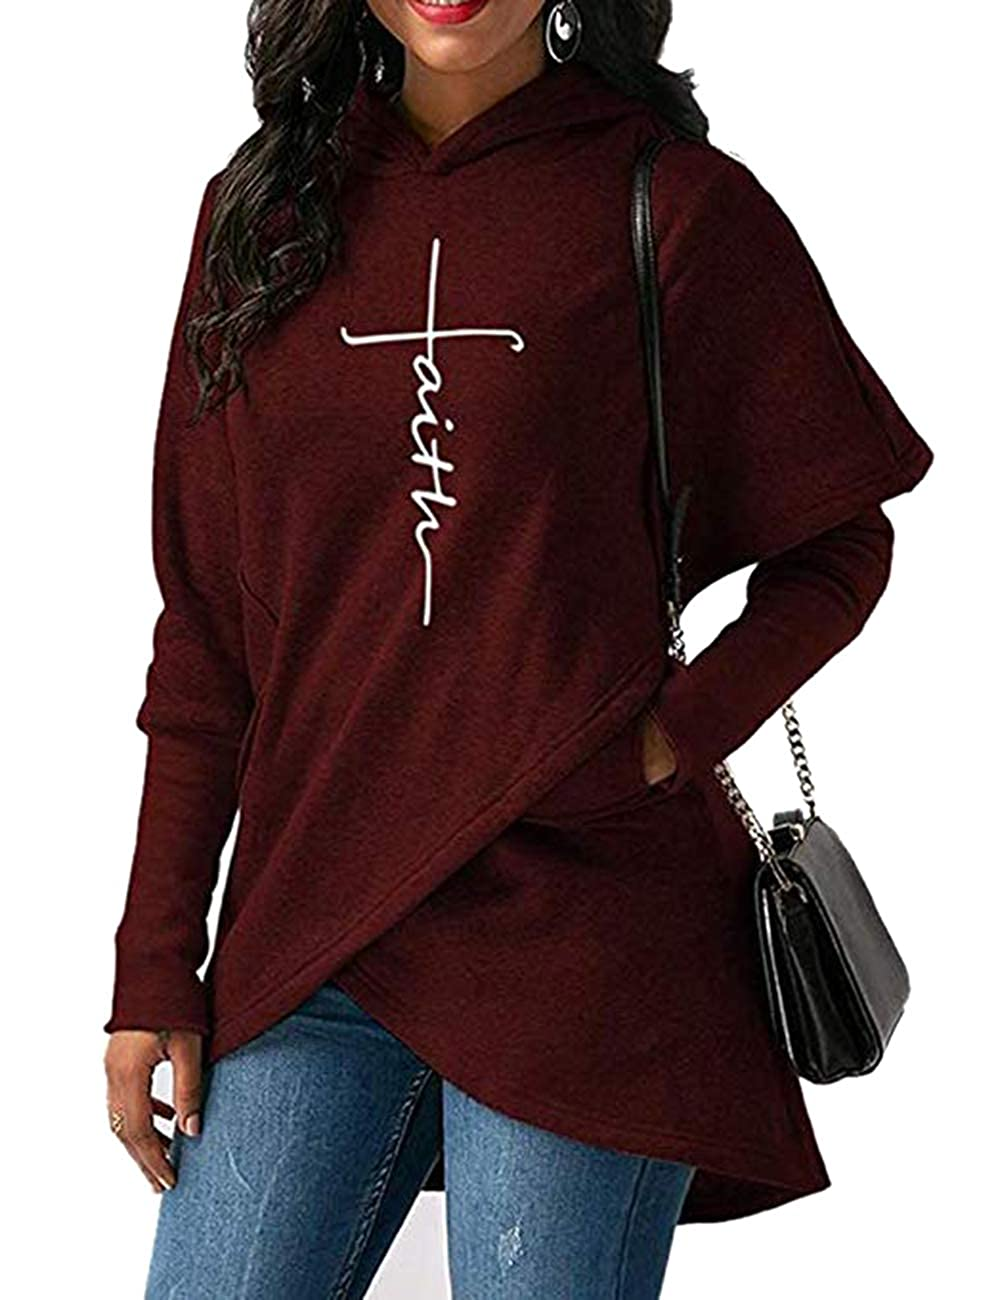 Lrud Women Novelty Hoodies Faith Embroidered Long Sleeve Tops Pocket Sweatshirt